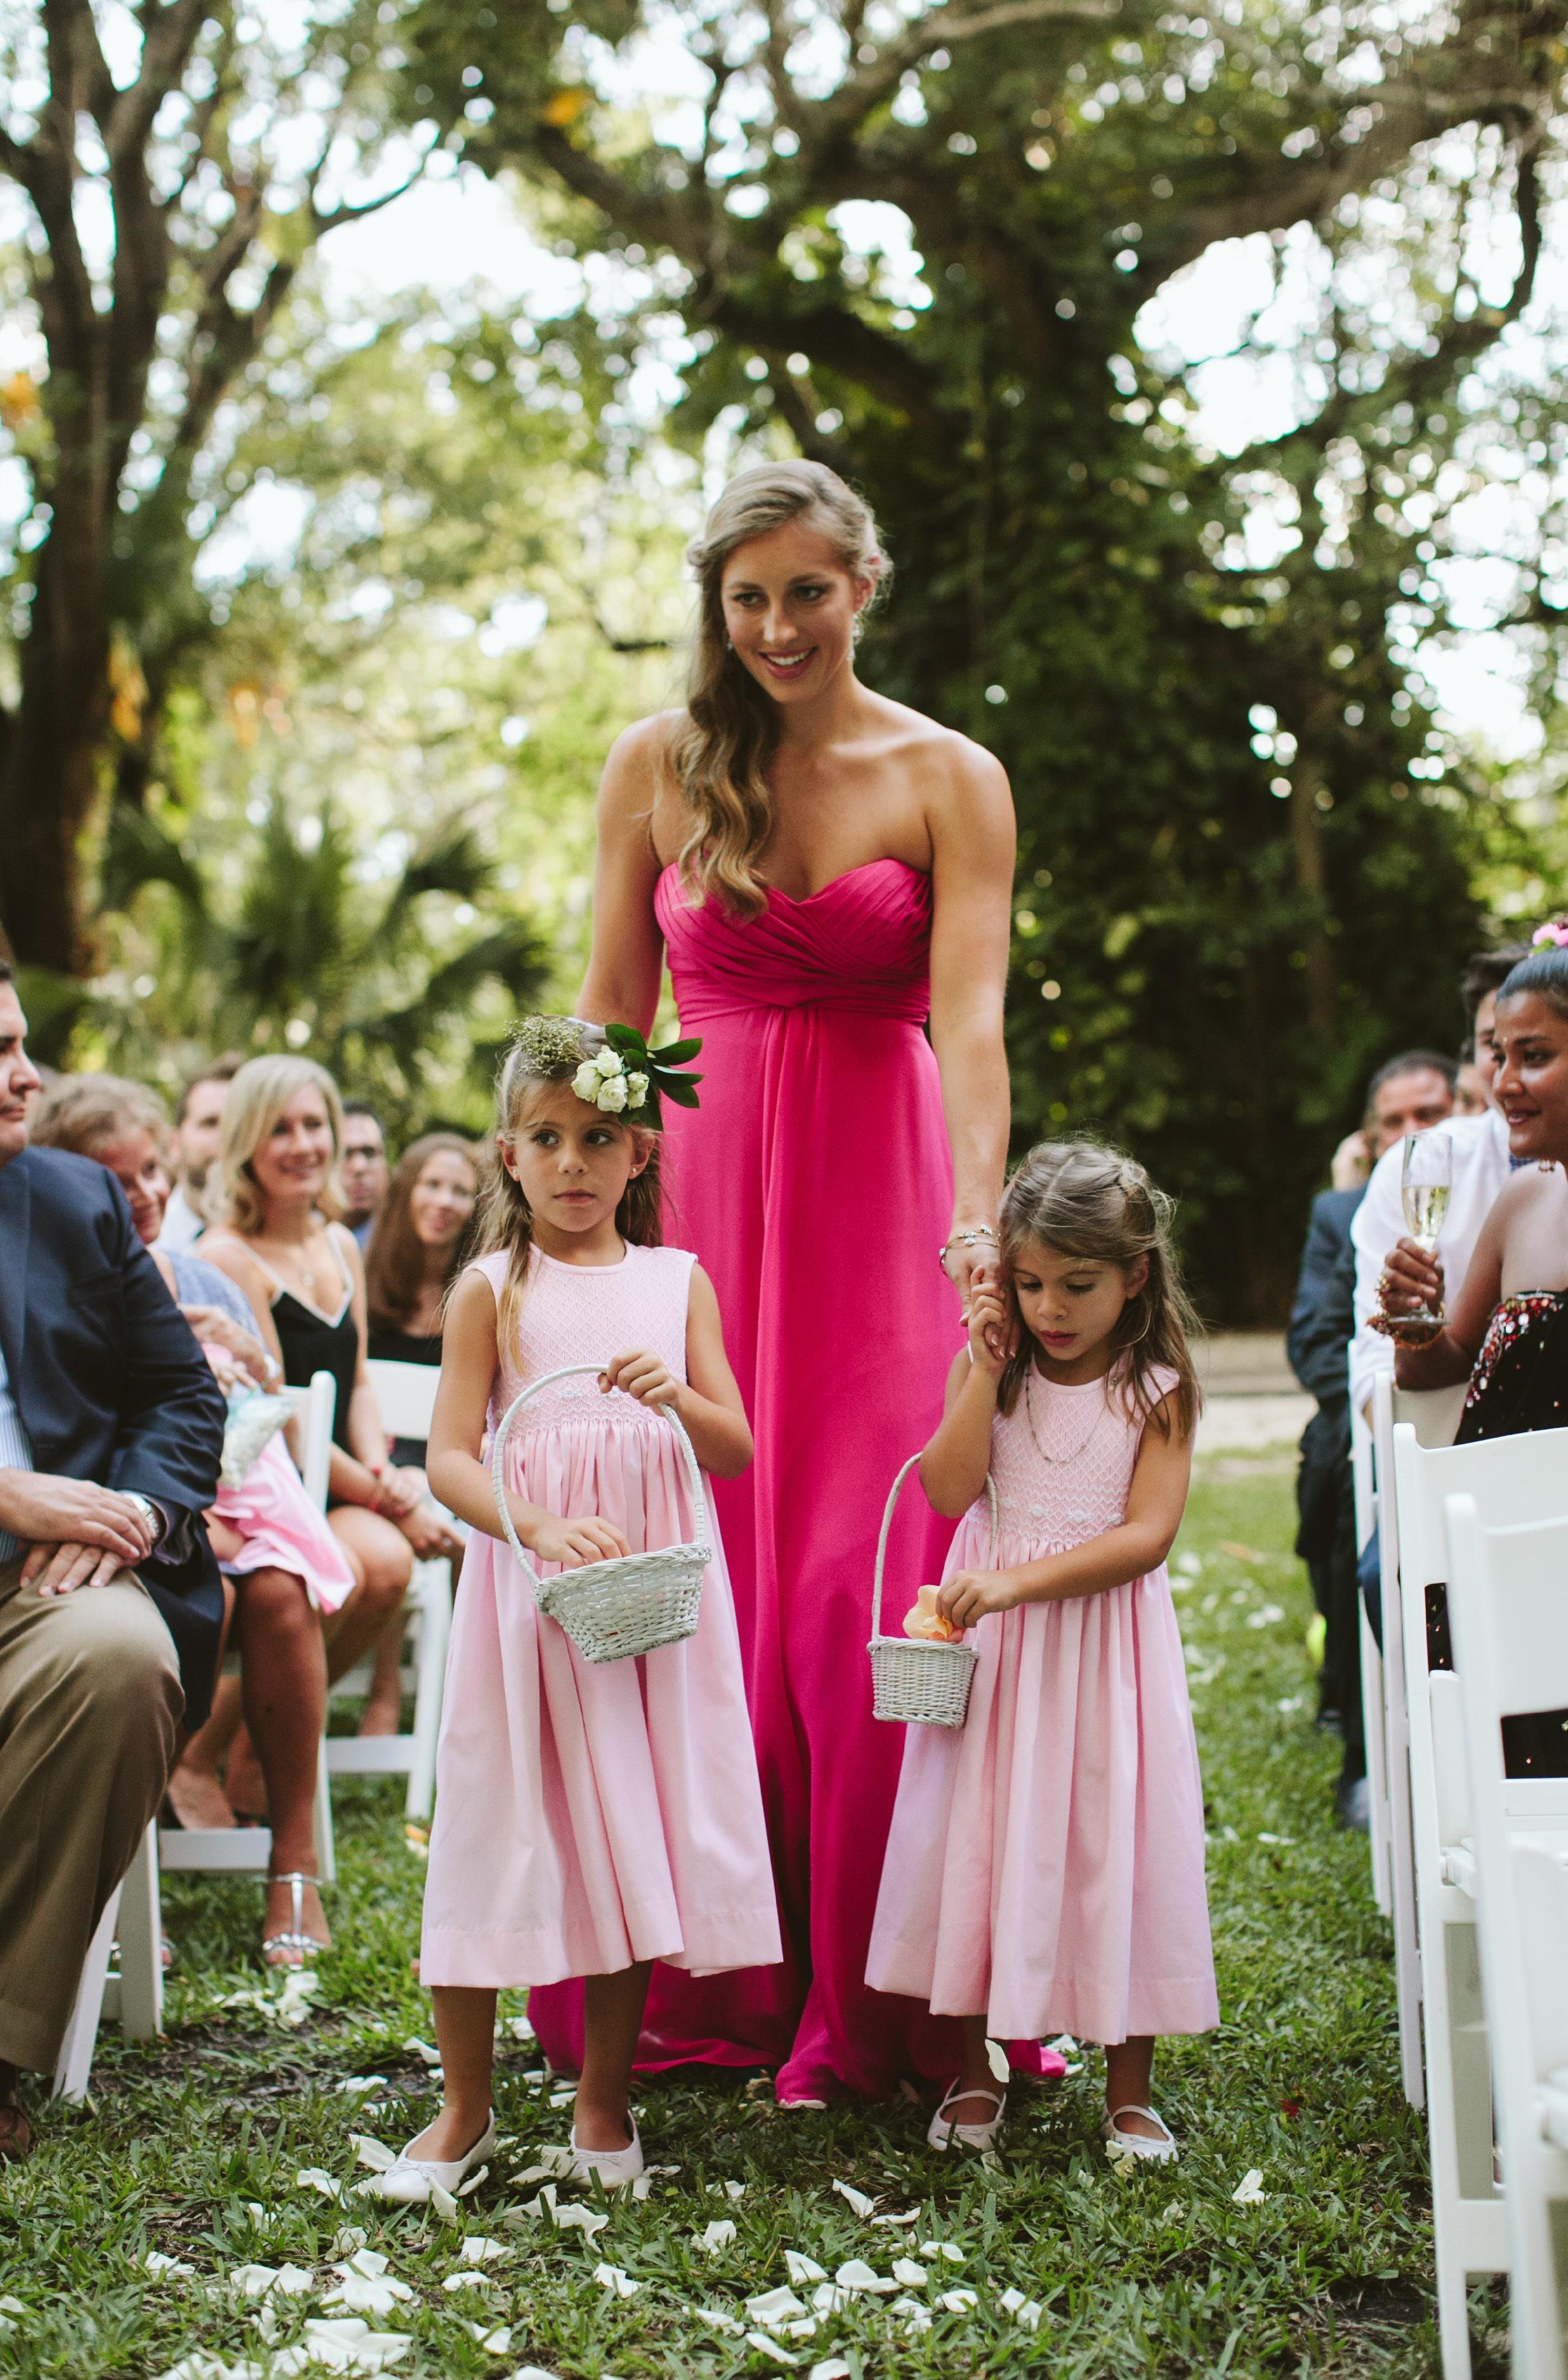 Meli + Mike Coconut Grove Wedding at Villa Woodbine44.jpg